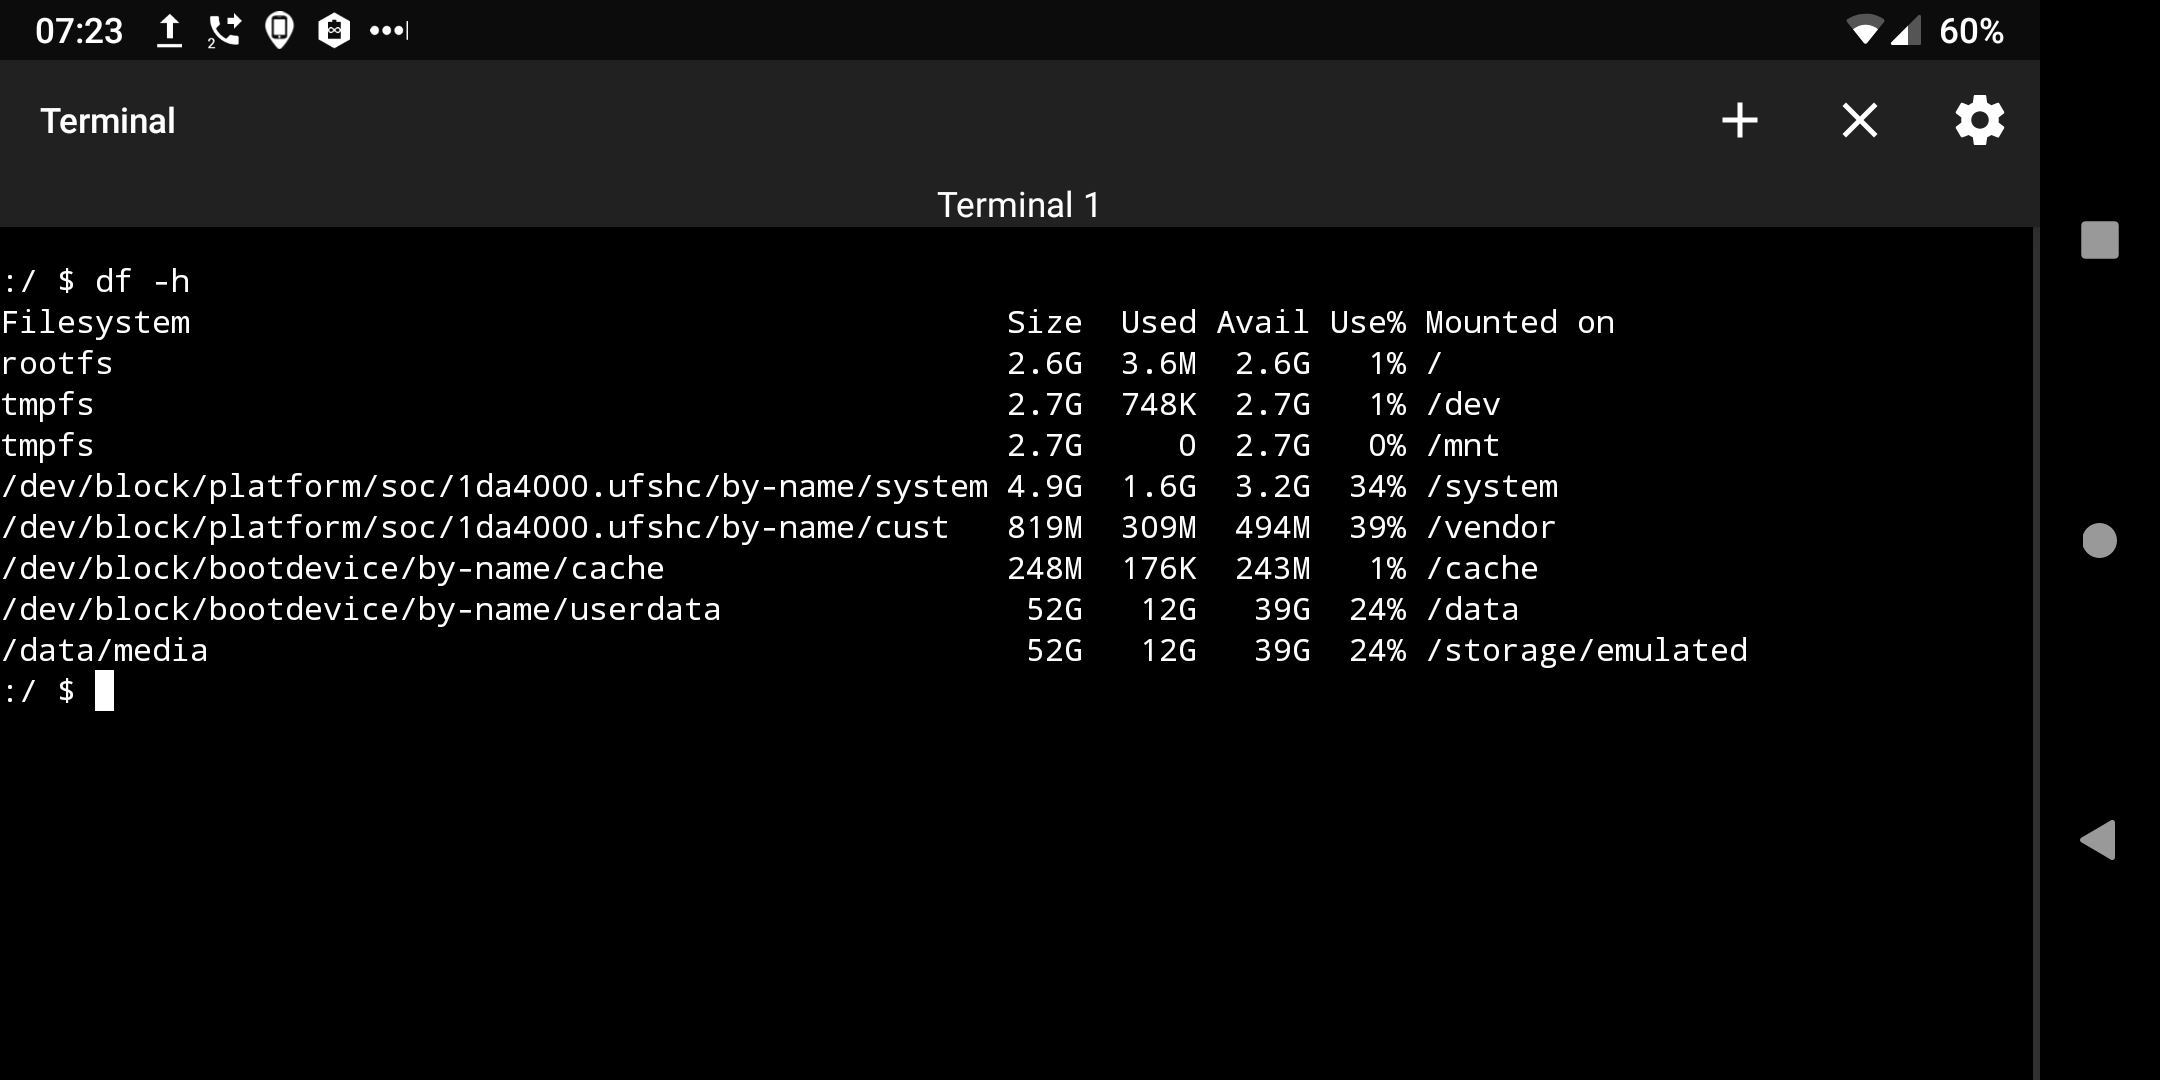 Screenshot_20201231-072308_Terminal